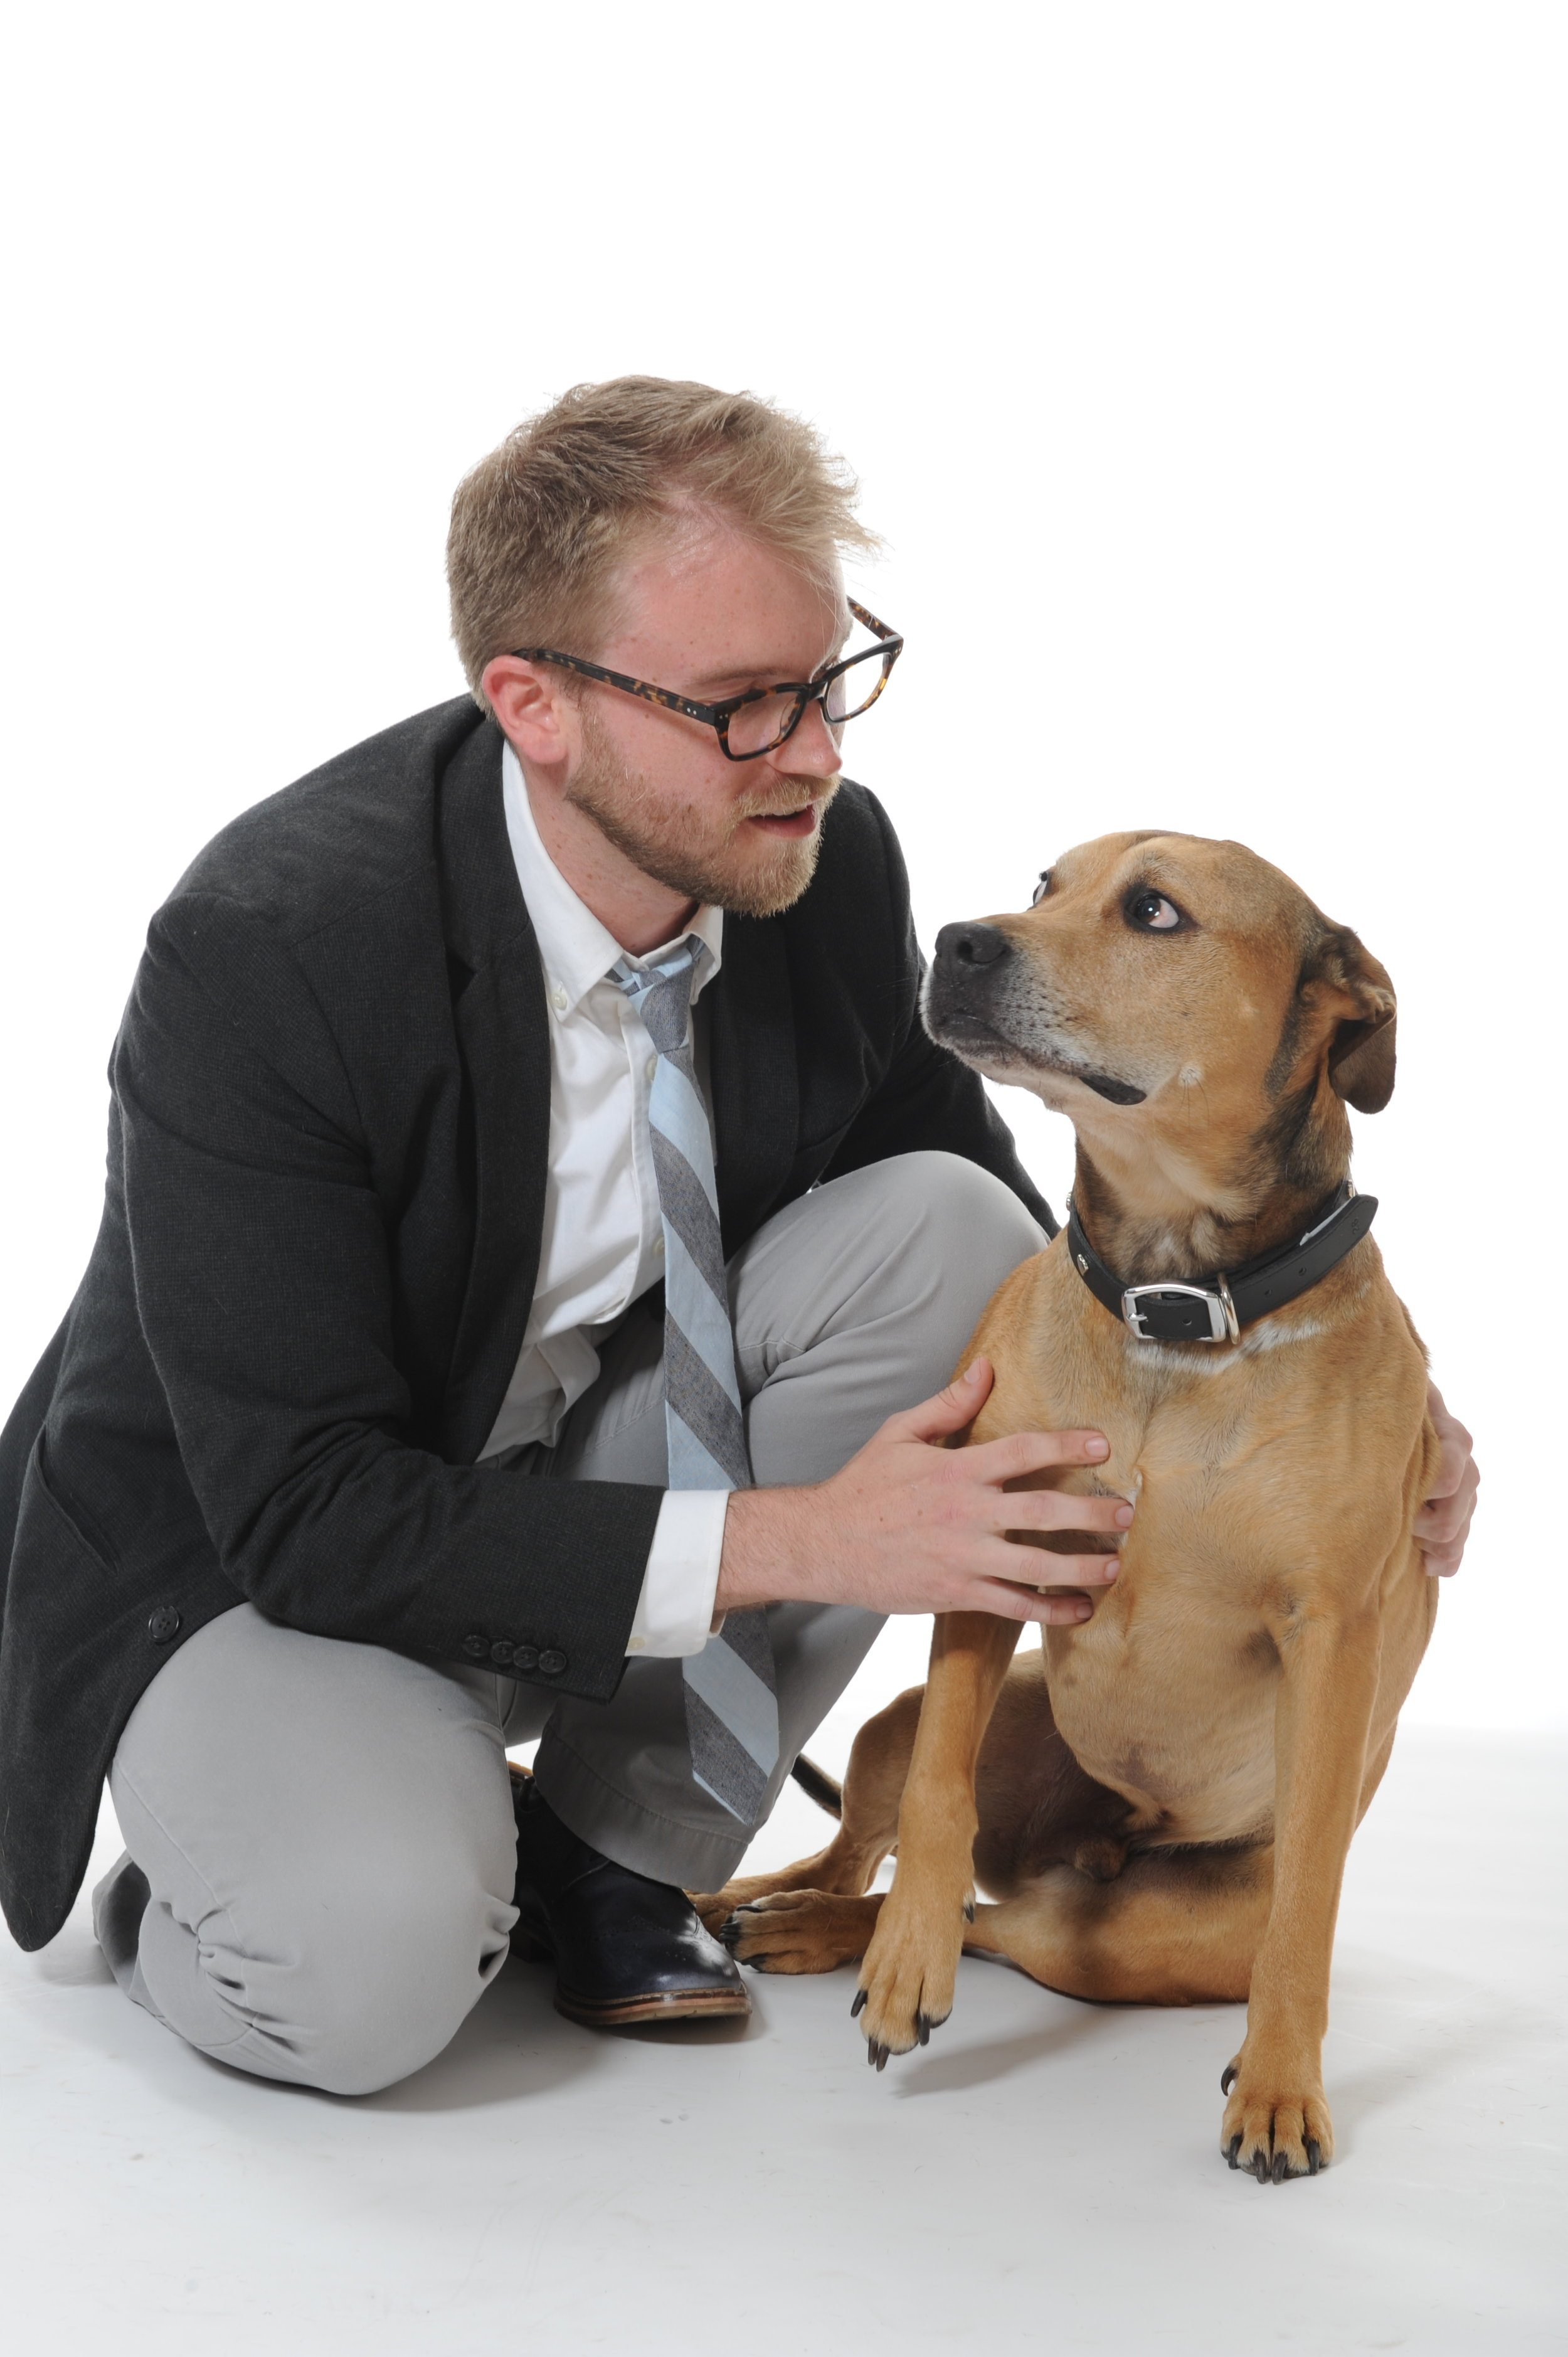 Dan and his dog, Charlie.